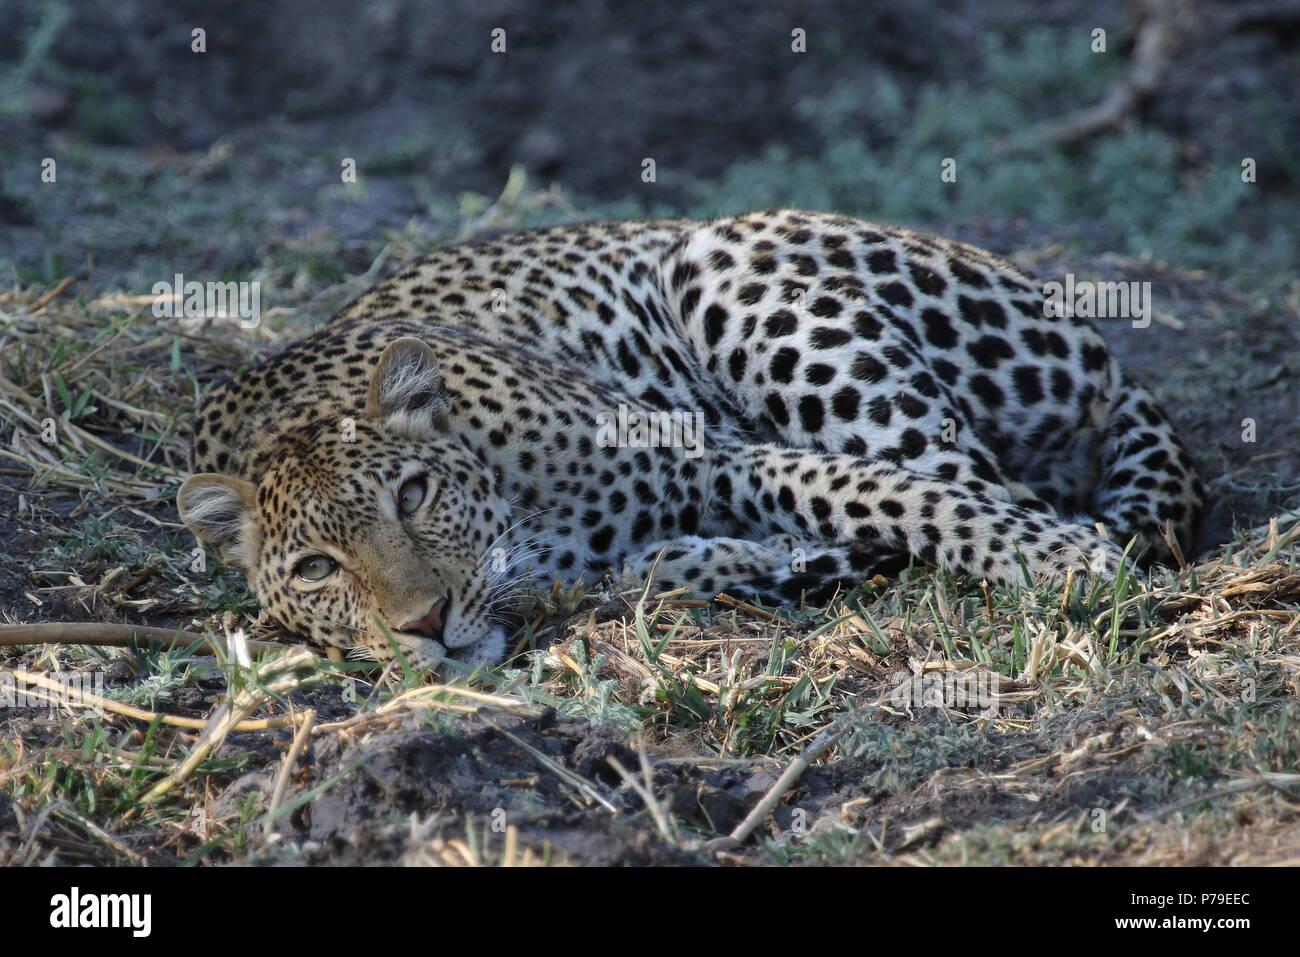 Katavi leopard snoozing - Stock Image